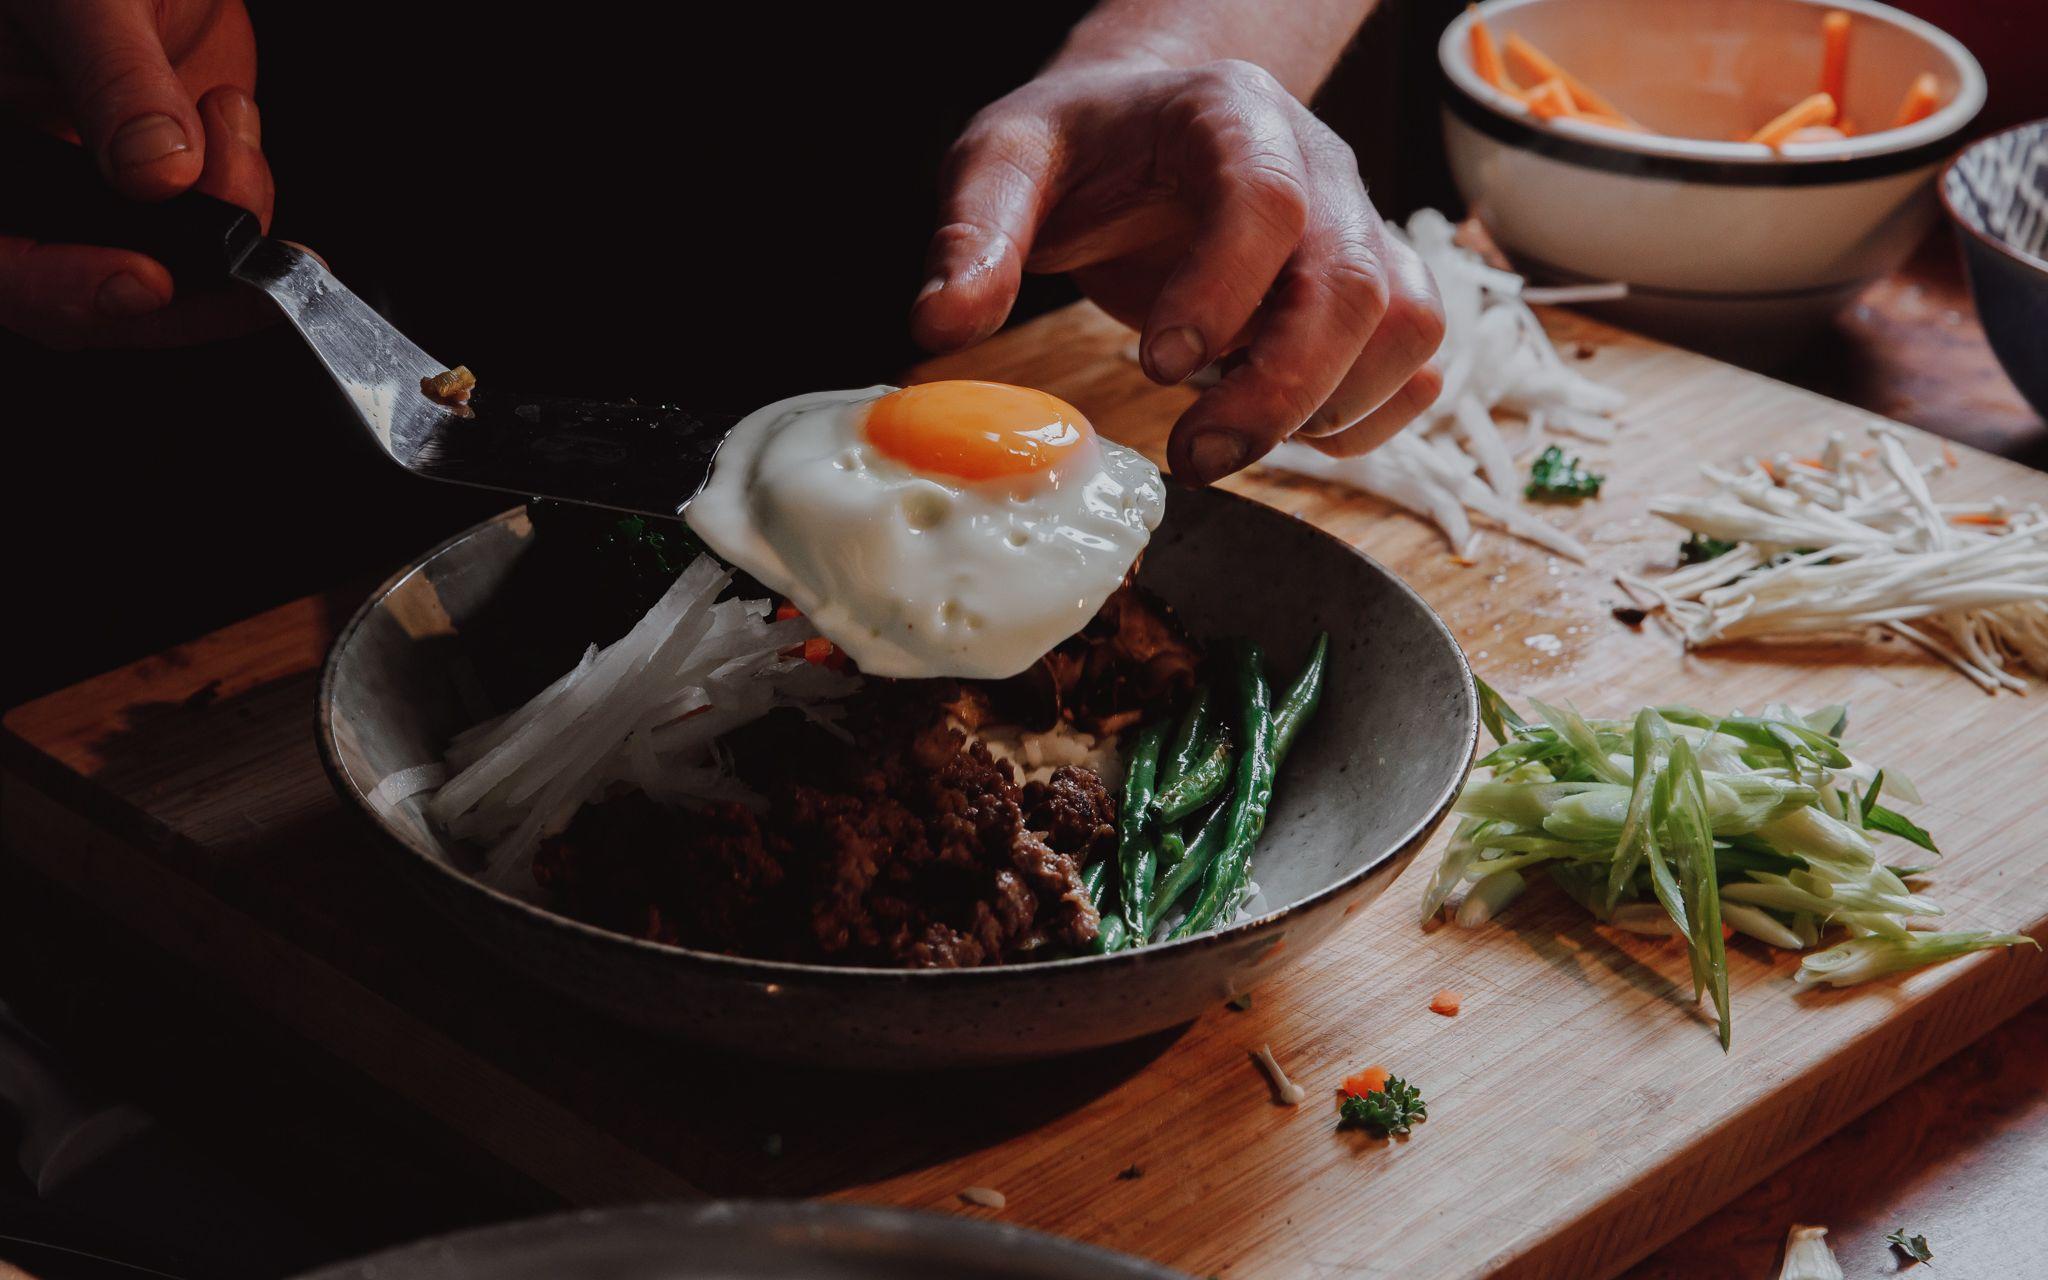 Venison Bi bim bap being plated with a fried egg